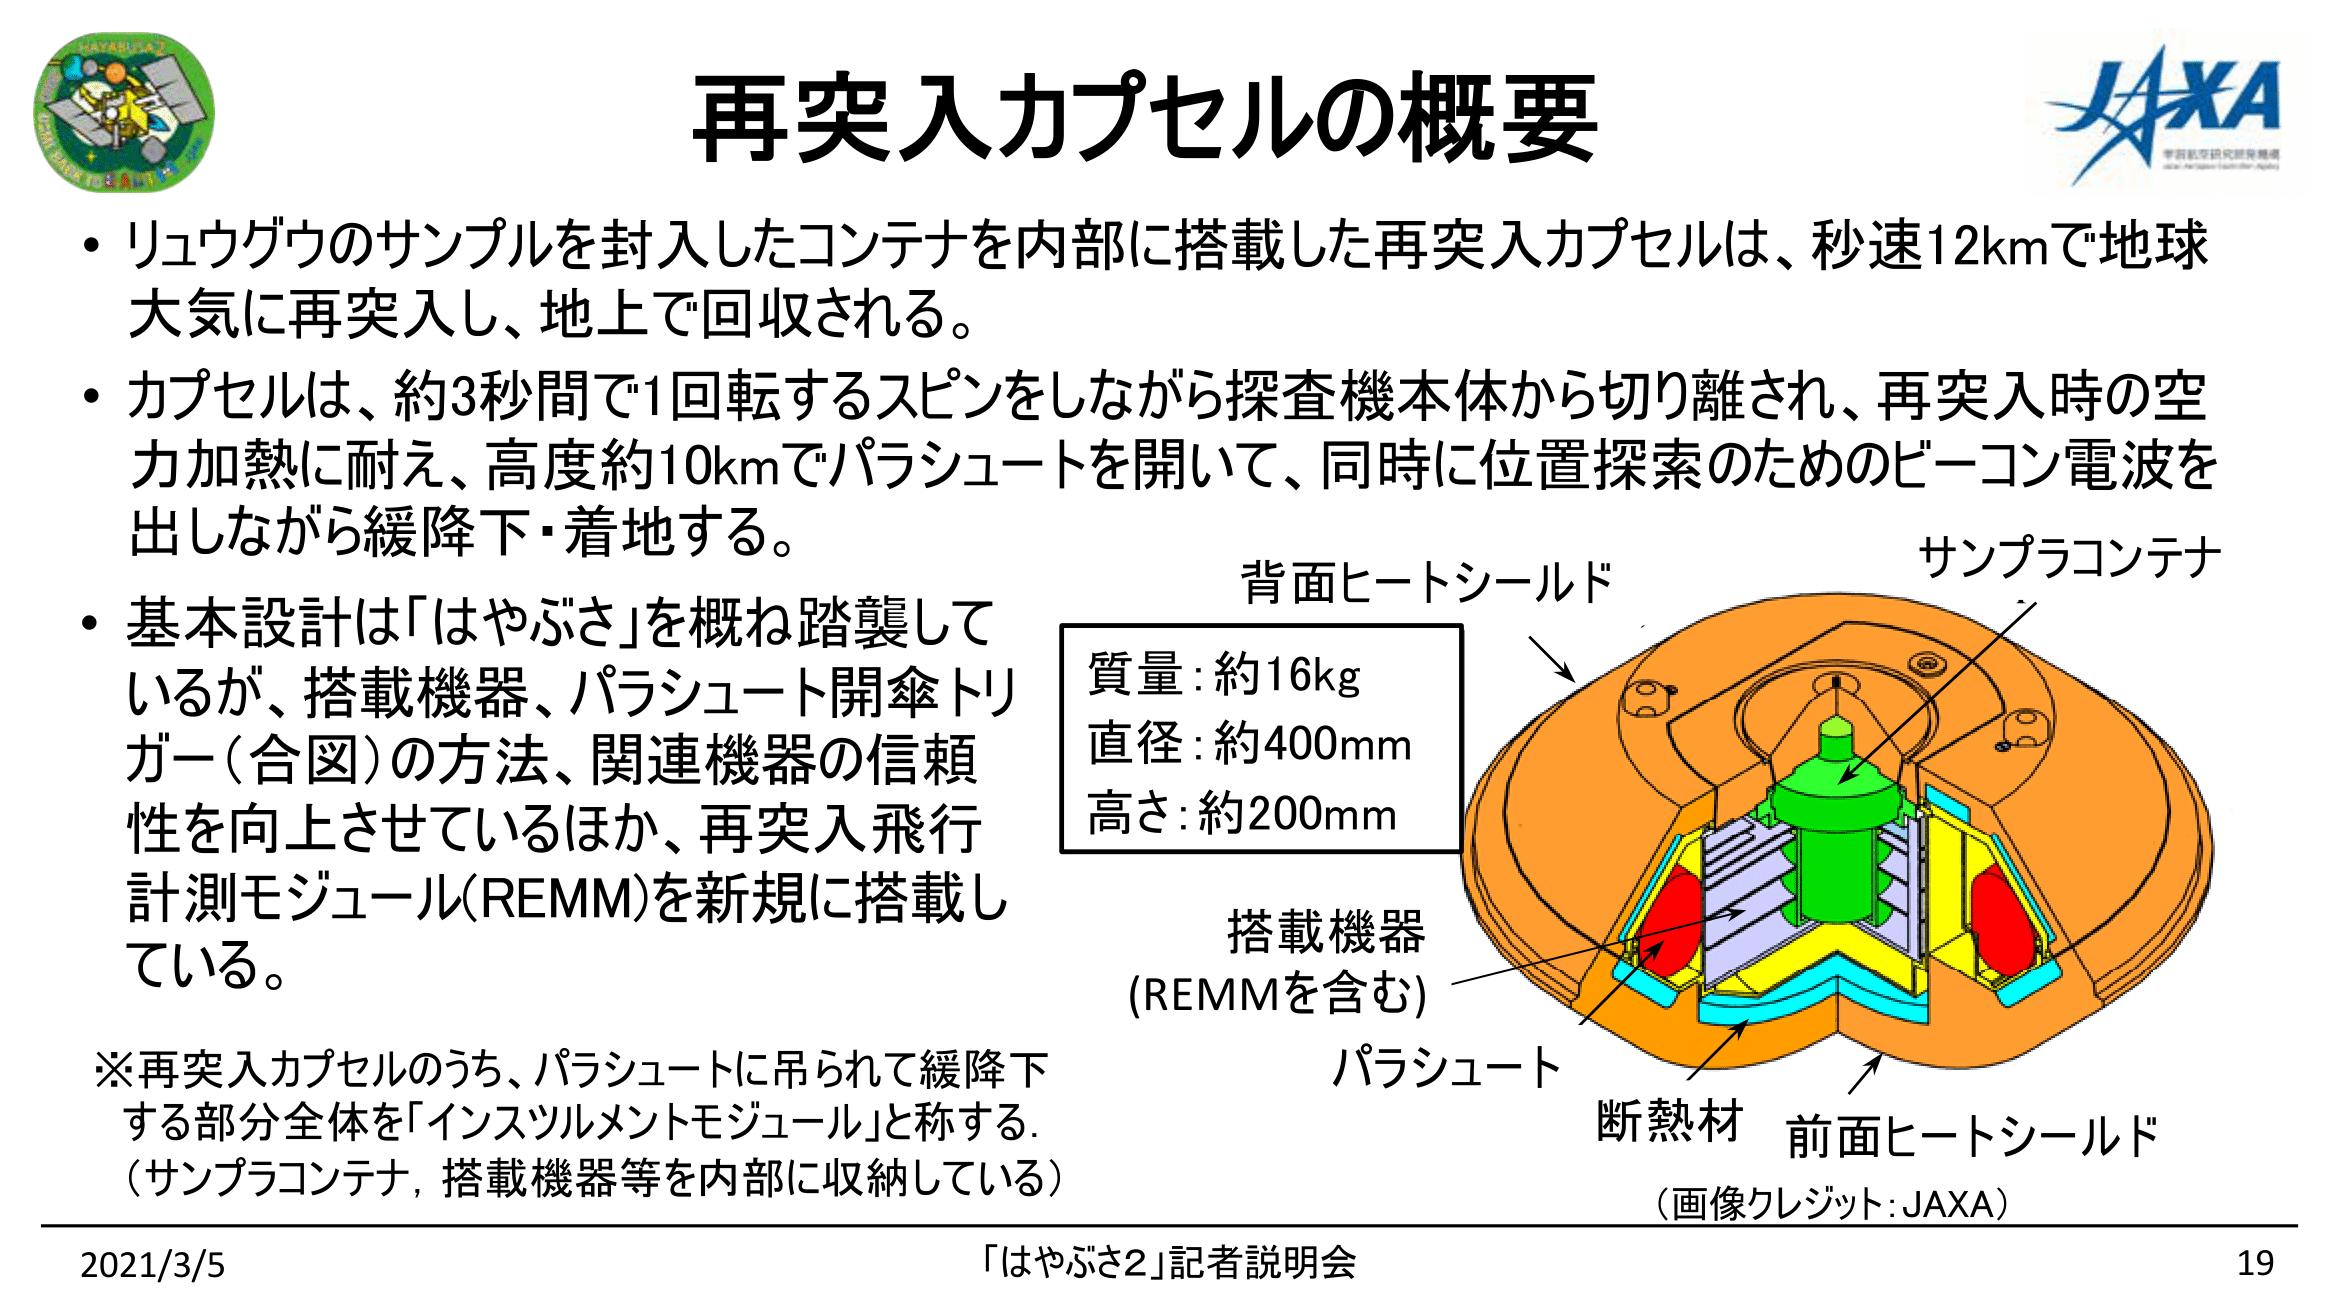 f:id:Imamura:20210305134324p:plain